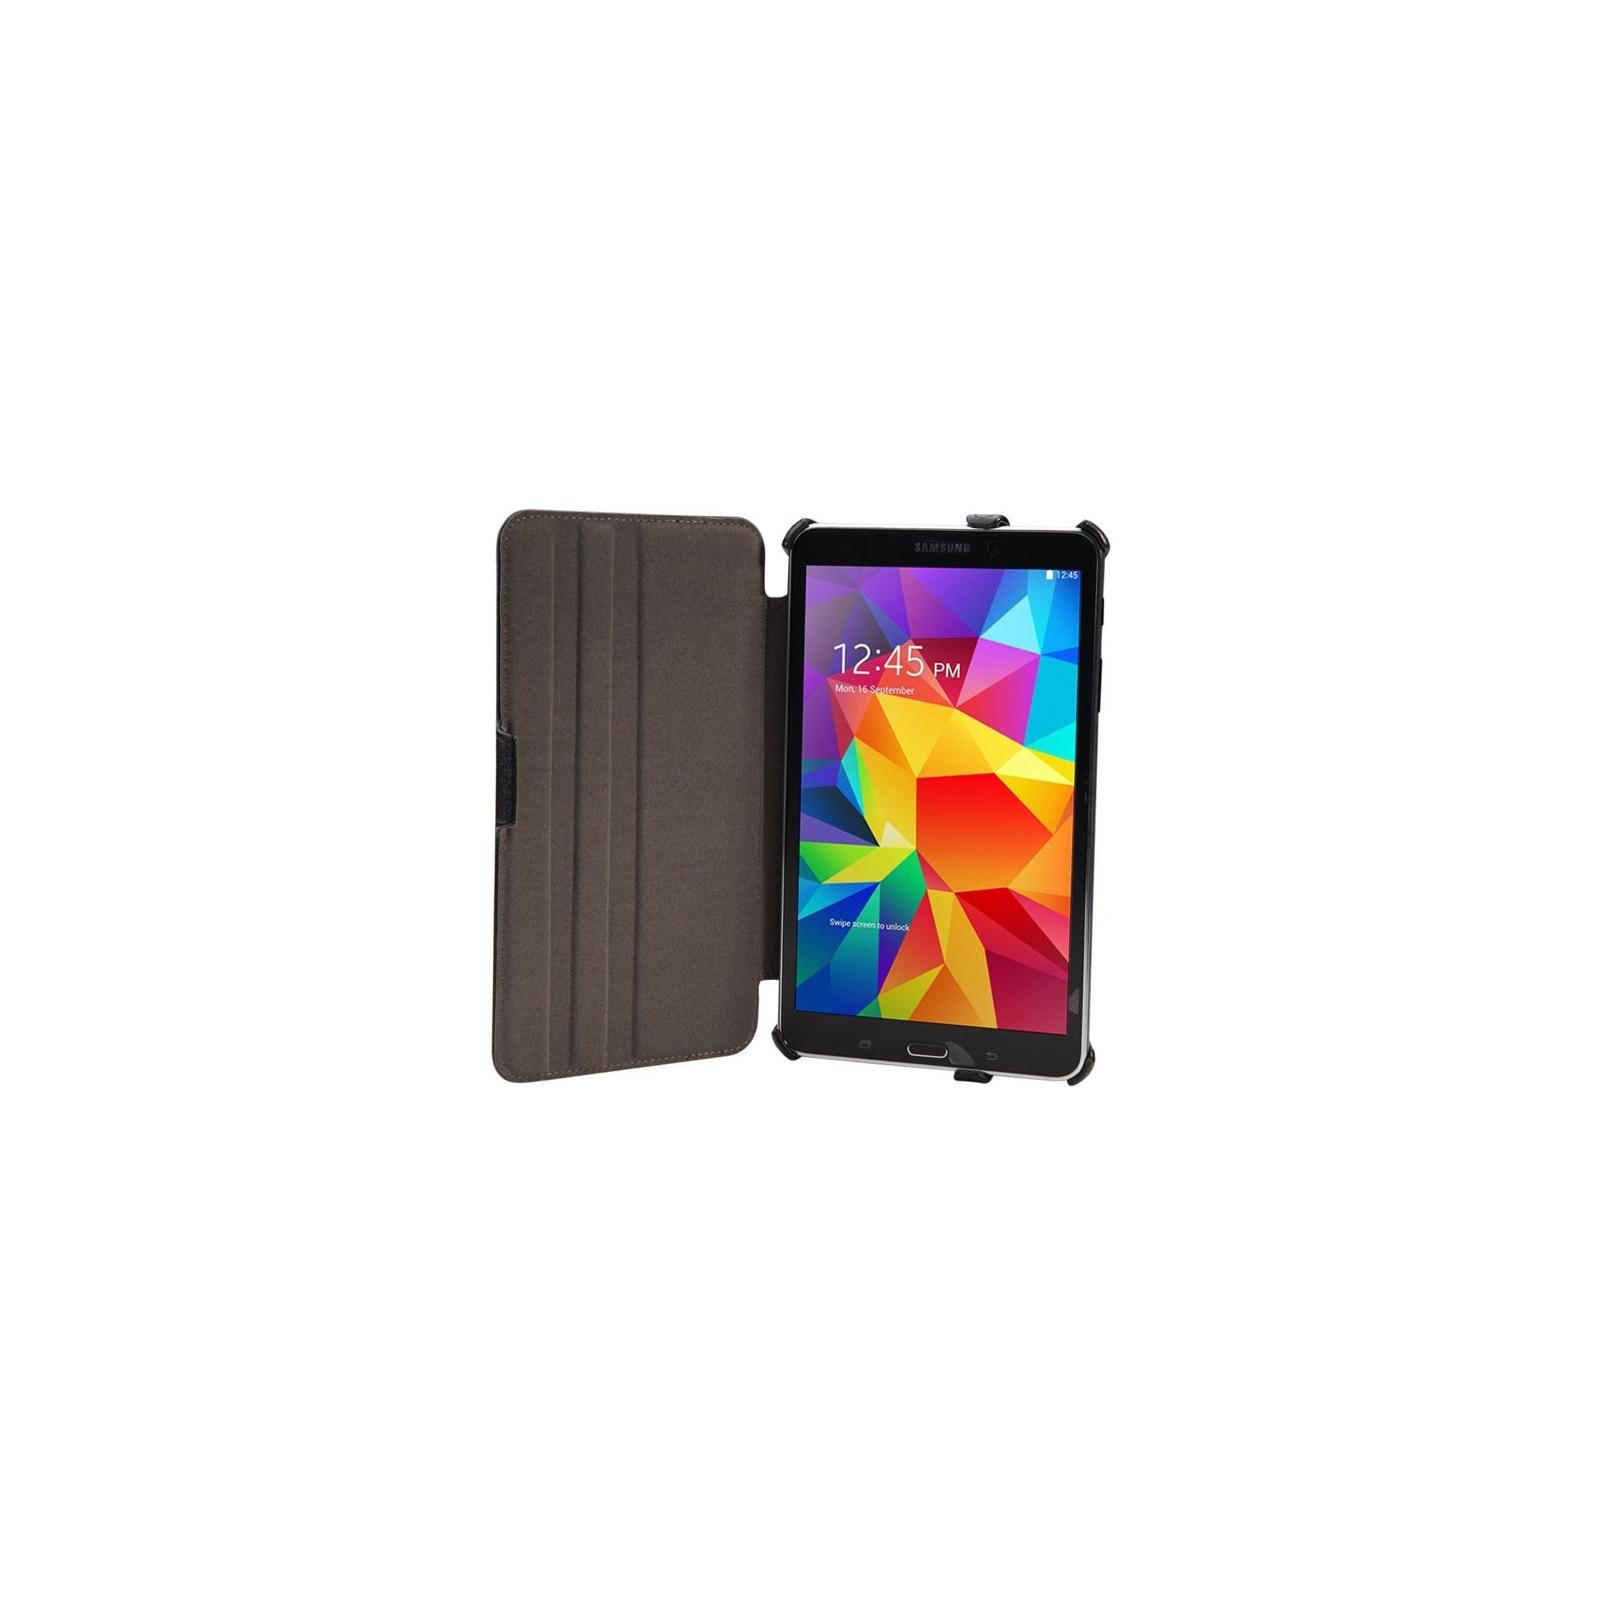 Чехол для планшета AirOn для Samsung GALAXY Tab 4 8.0 black (6946795850168) изображение 2